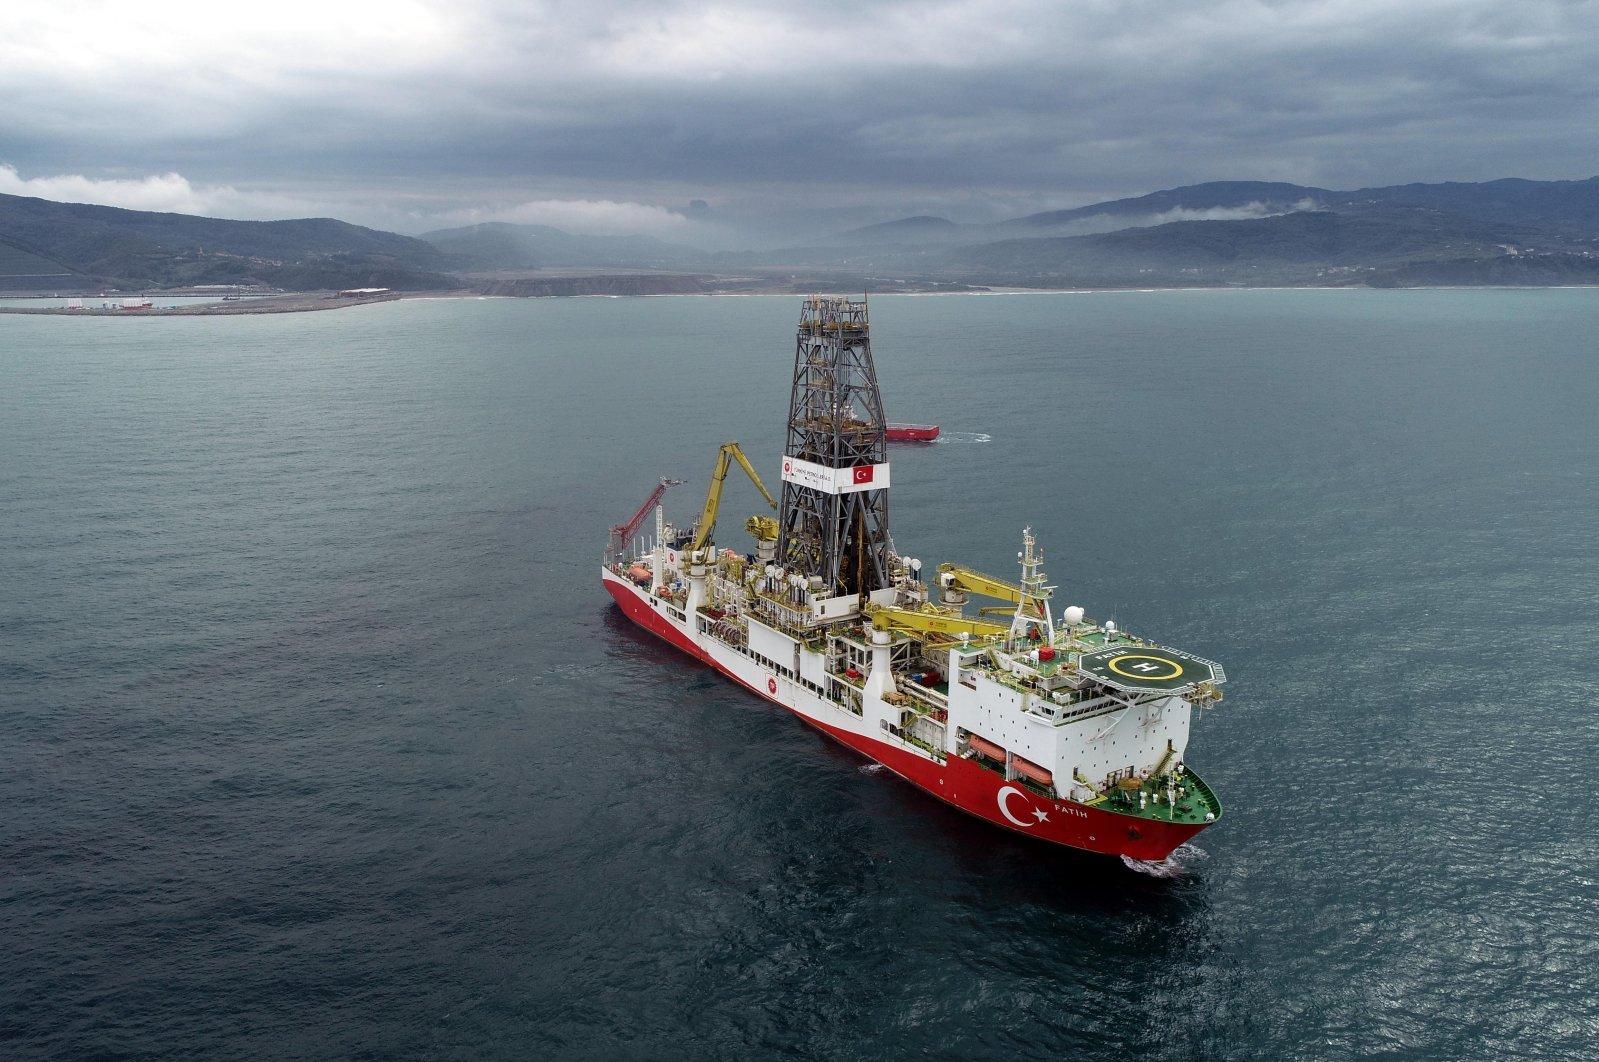 Drillship Fatih offshore from the Black Sea coast, Turkey, Oct. 20, 2020. (DHA Photo)